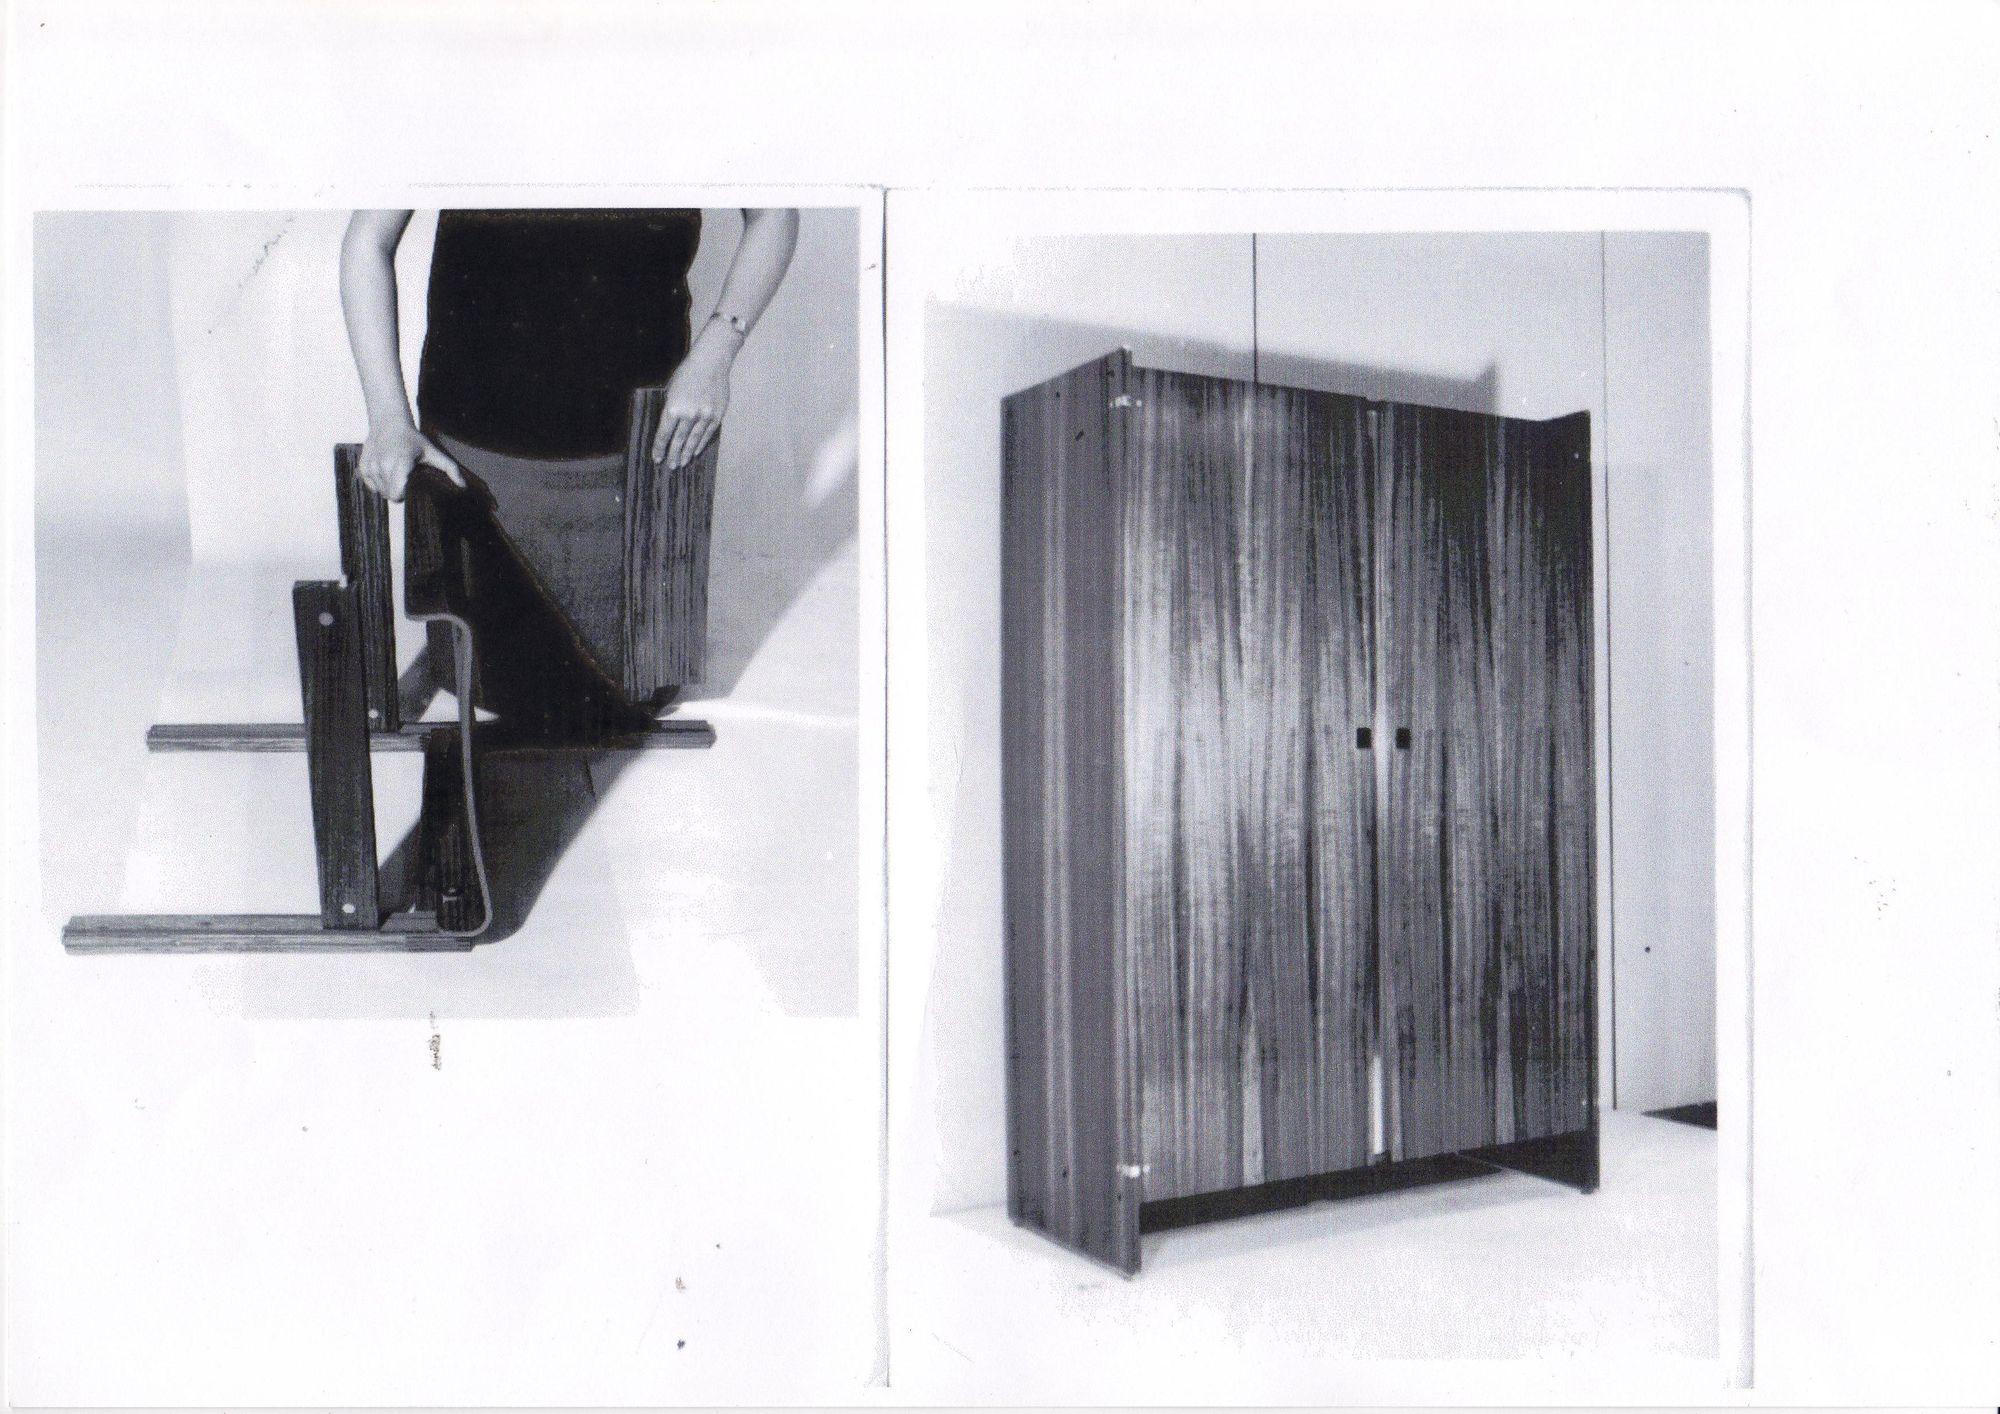 Decoplan meubelen De Coene 03